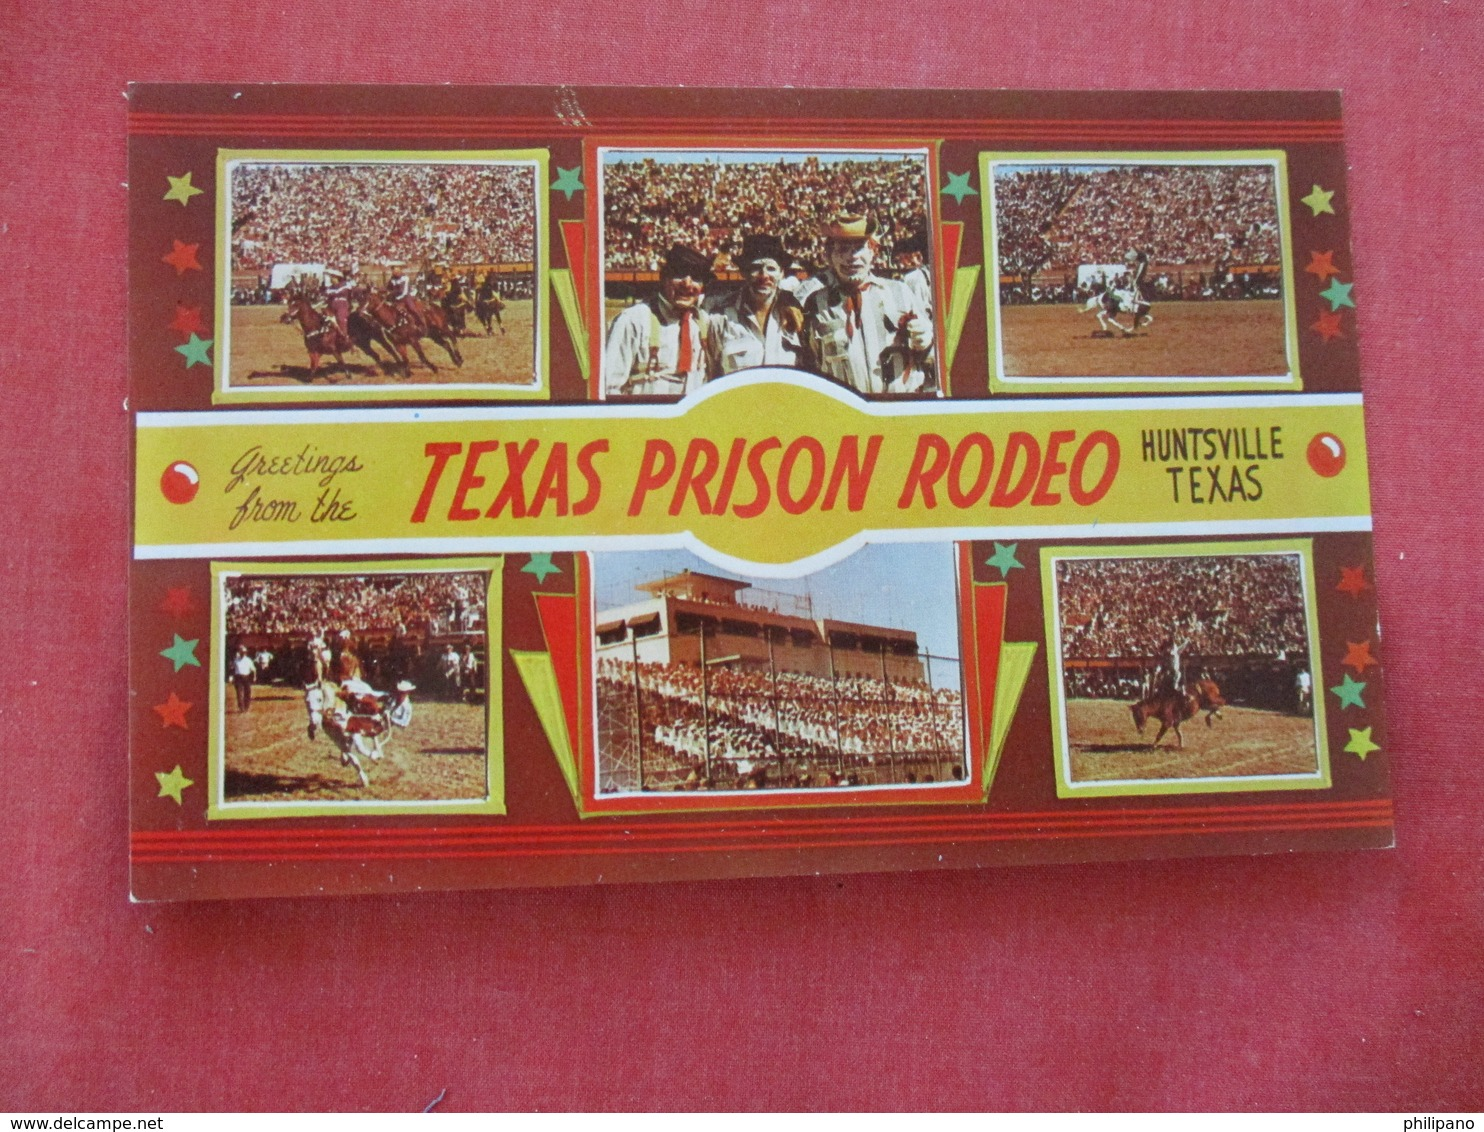 Texas  Prison Rodeo  Huntsville Texas  > --ref 2892 - Prison